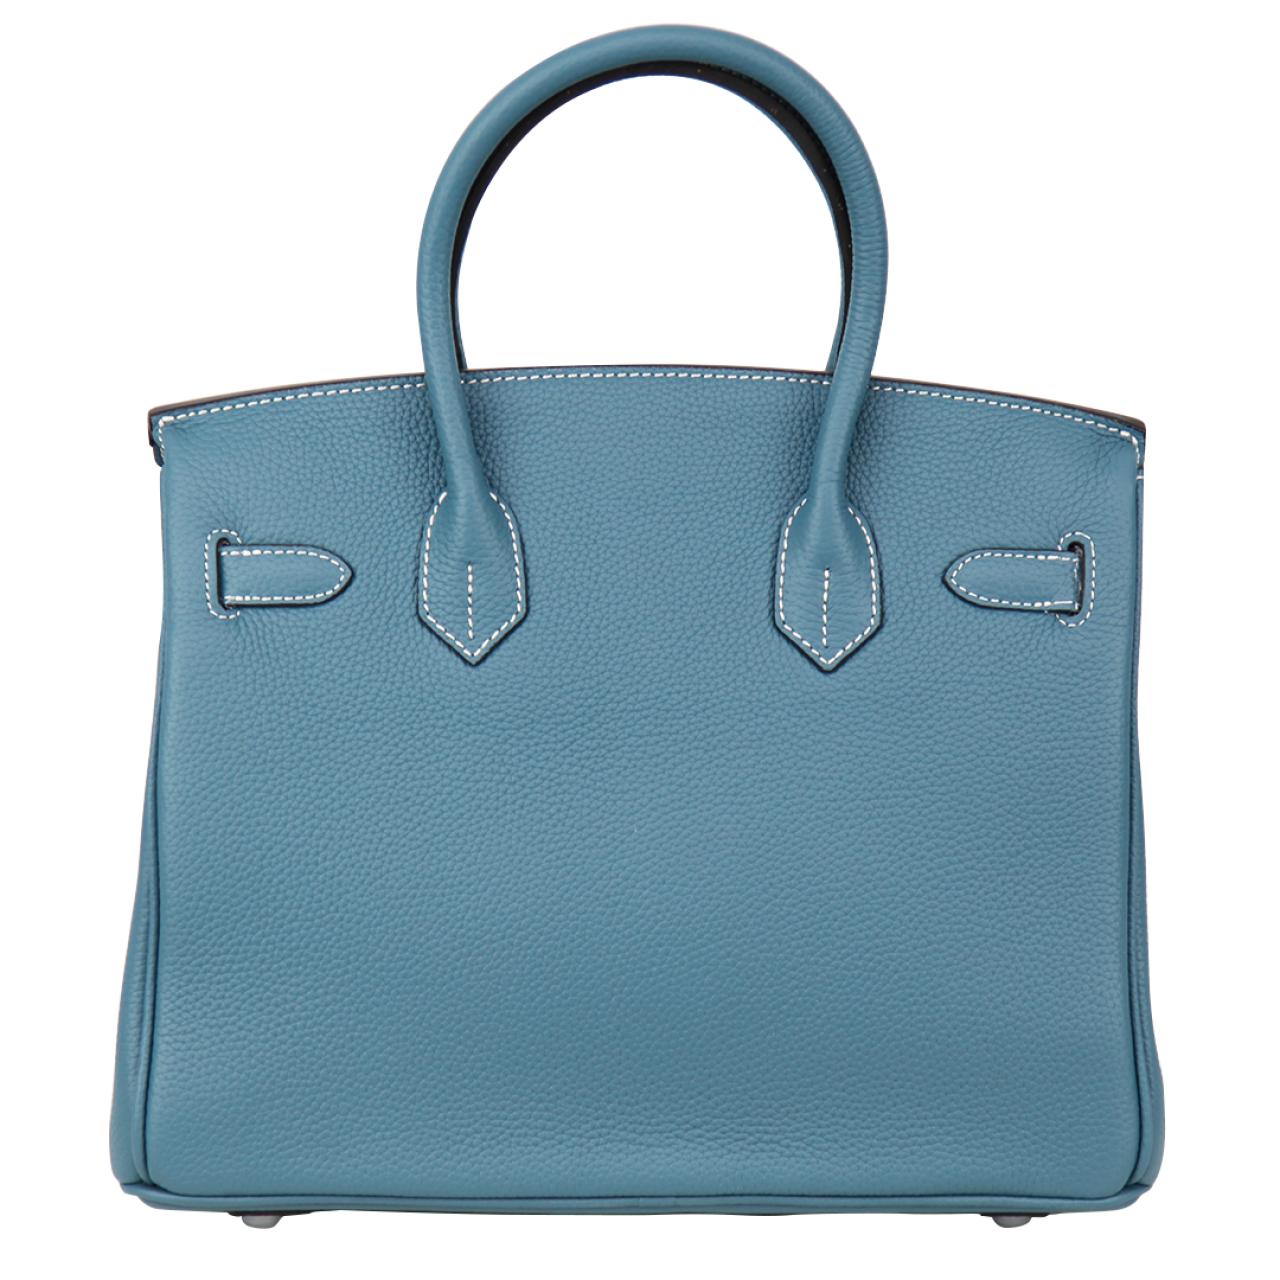 Zeekas Birkin Silver Hardware Blue New PU Leather Tote Bag